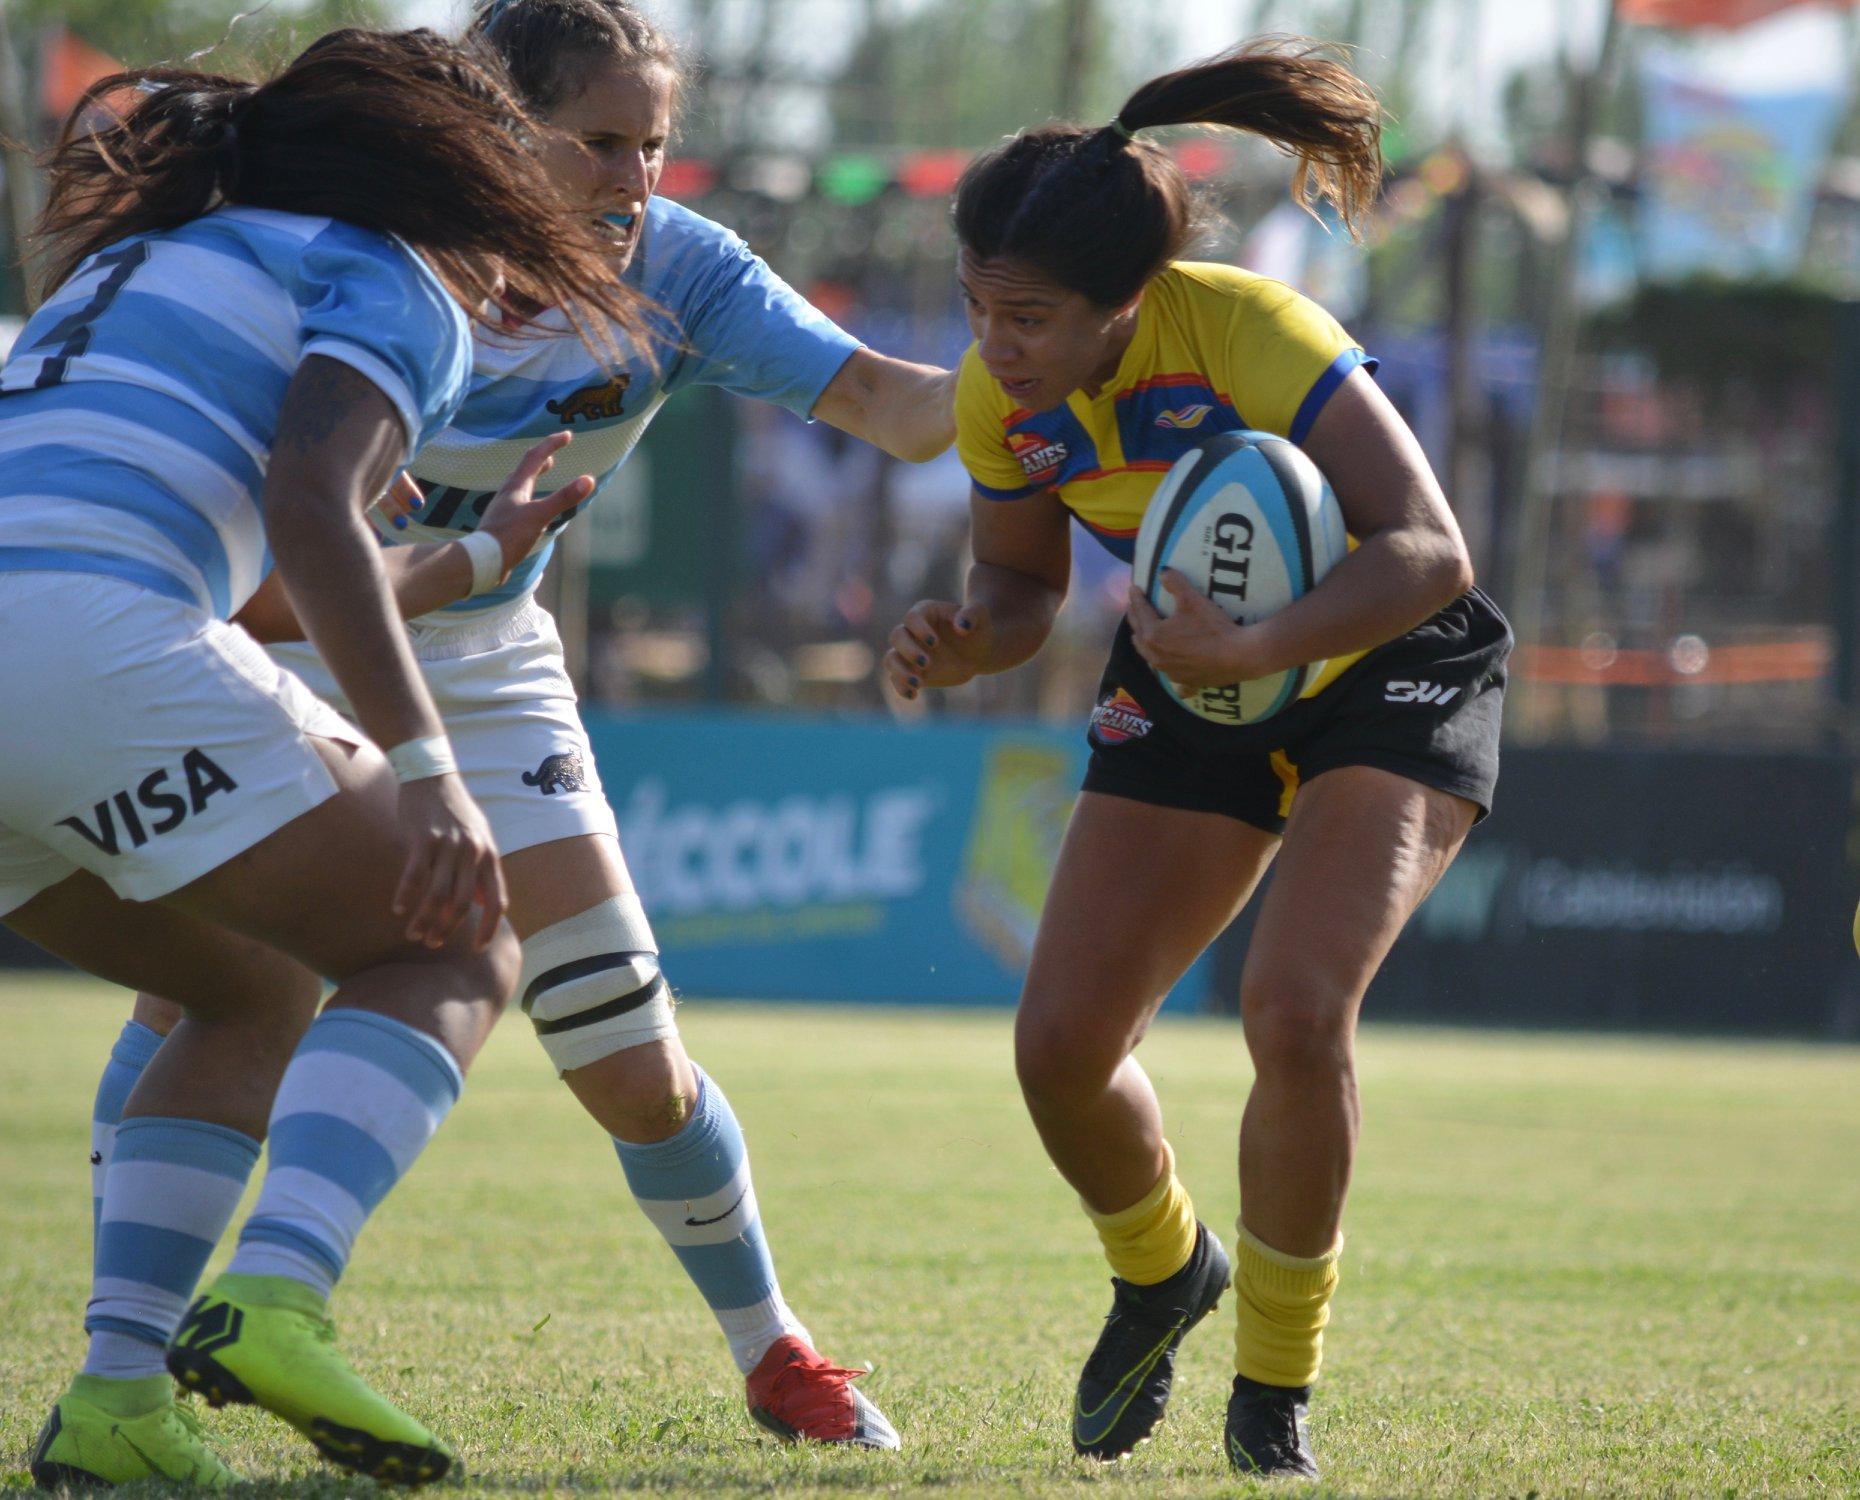 Argentina y Colombia jugarán elHSBC World Rugby Sevens Challenger Series femenino